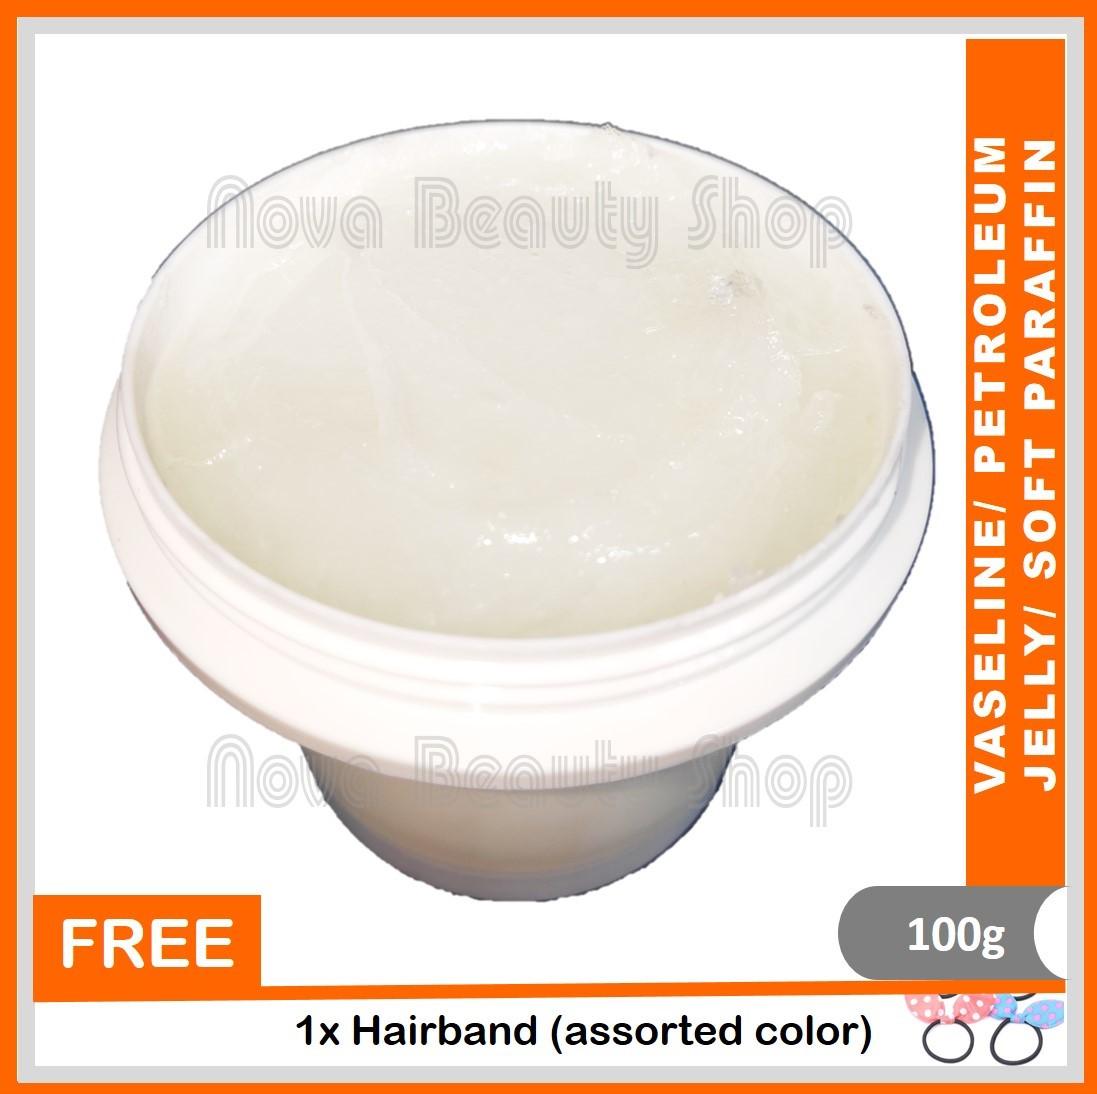 100G Petroleum Jelly/ Vaseline/ Soft Paraffin 100% pure